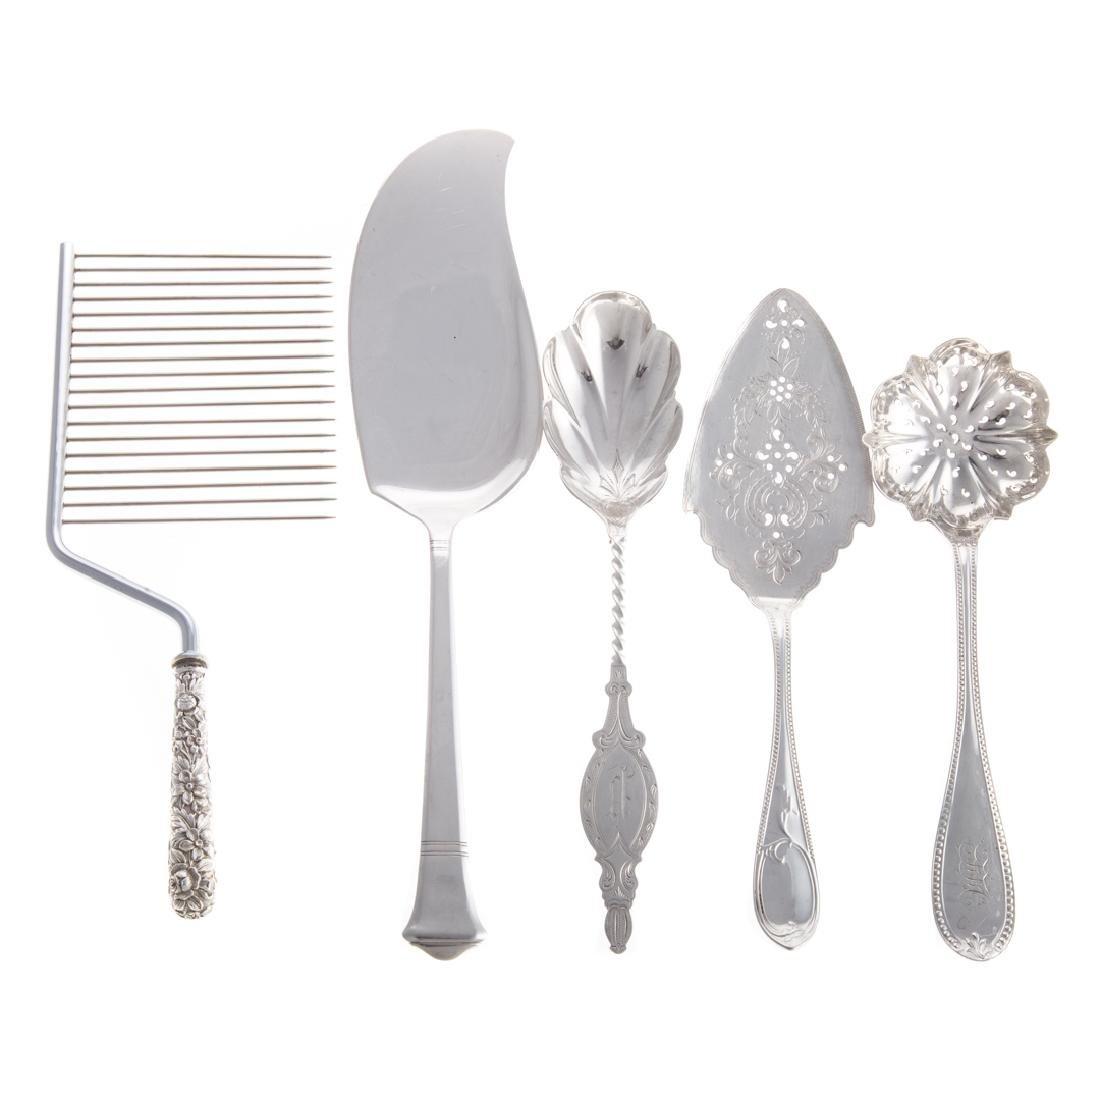 5 American silver serving pieces